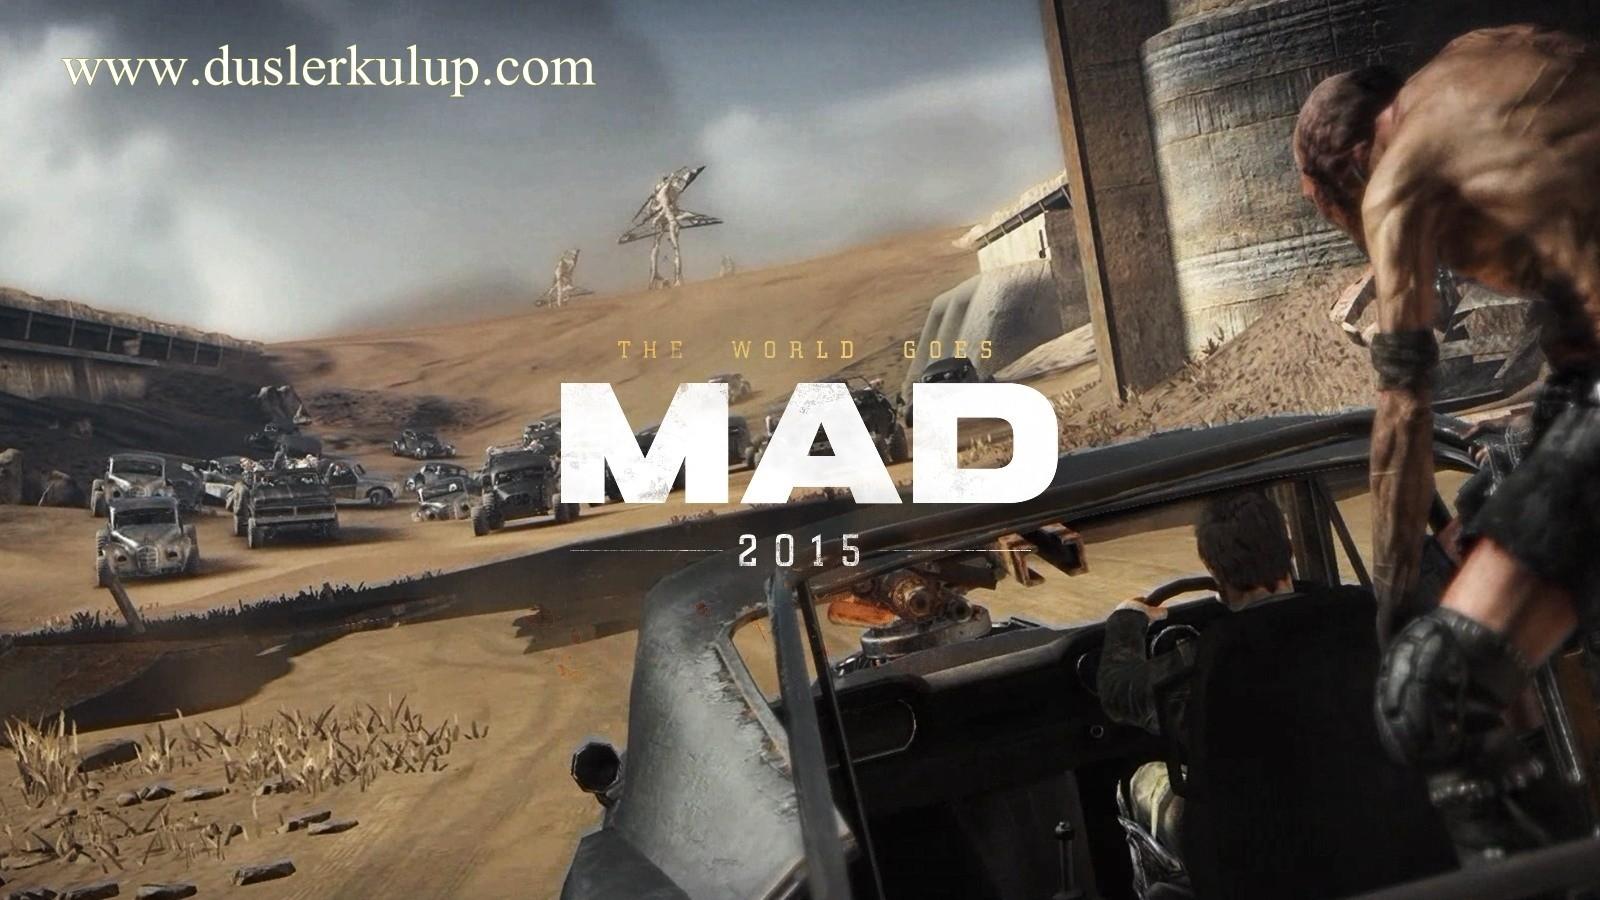 Mad Max Filminin Bilgisayar Oyununu Full İndir